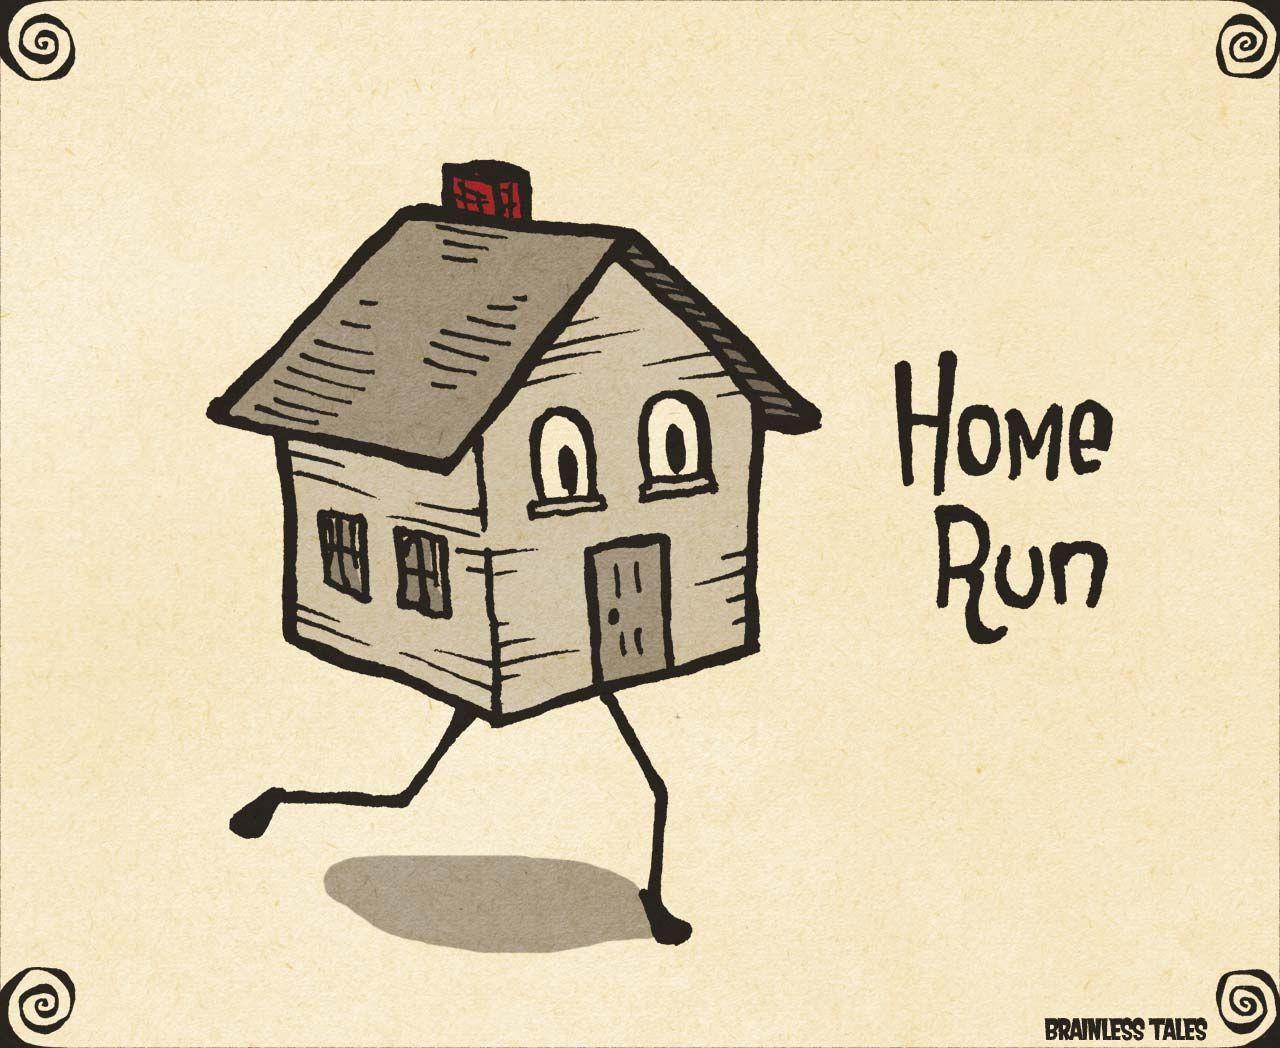 Home Run Visual Pun by Brainless Tales | Puns | Funny puns ...